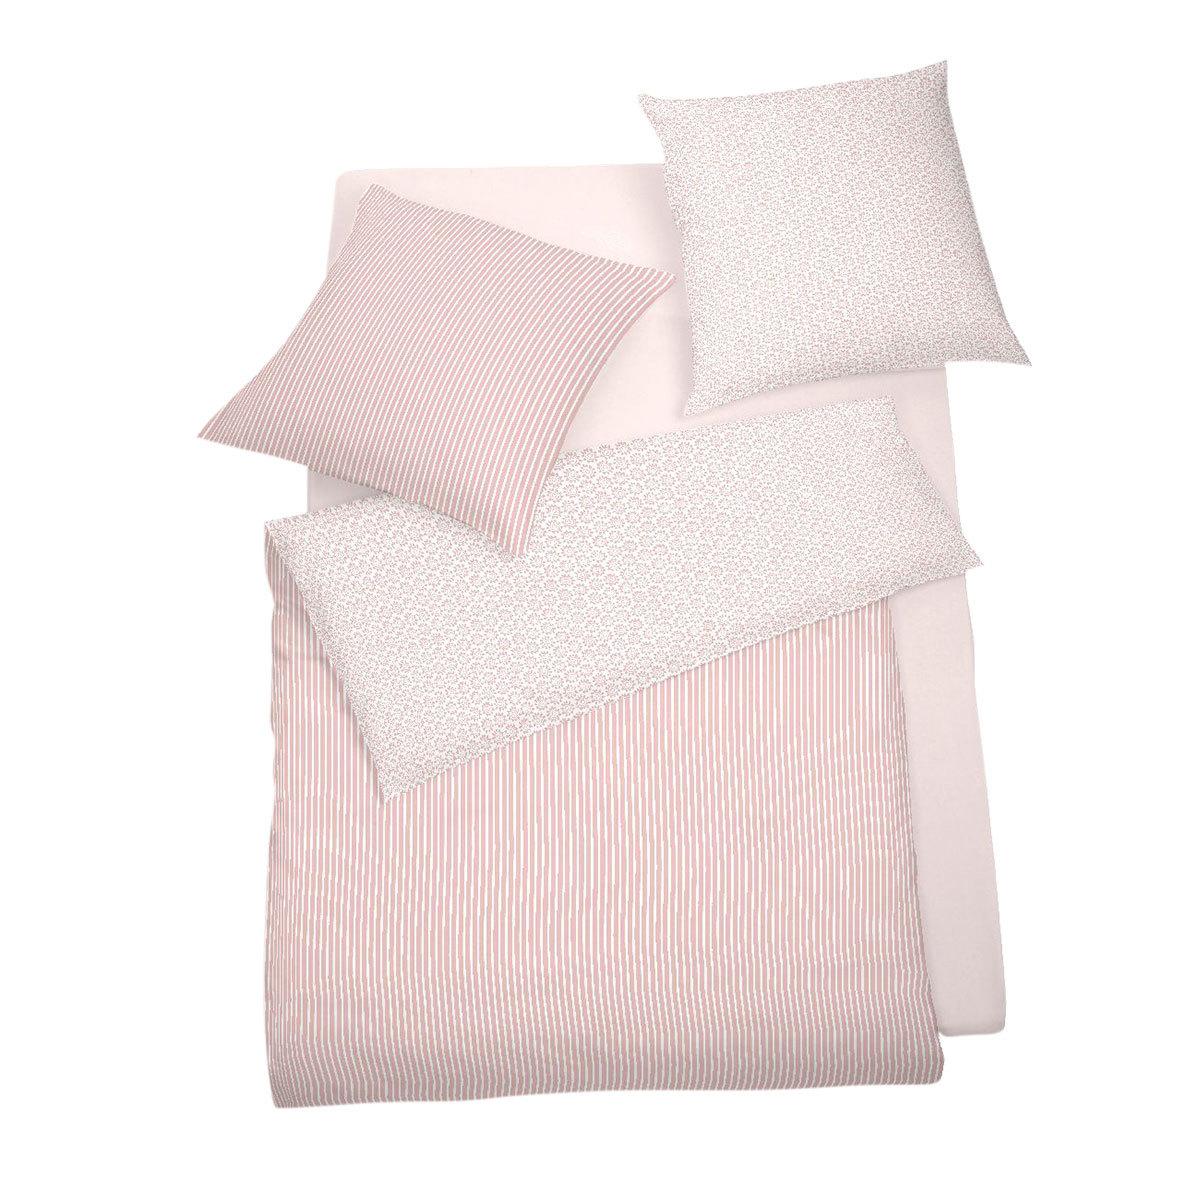 schlafgut casual cotton bettw sche pax flamingo g nstig online kaufen bei bettwaren shop. Black Bedroom Furniture Sets. Home Design Ideas